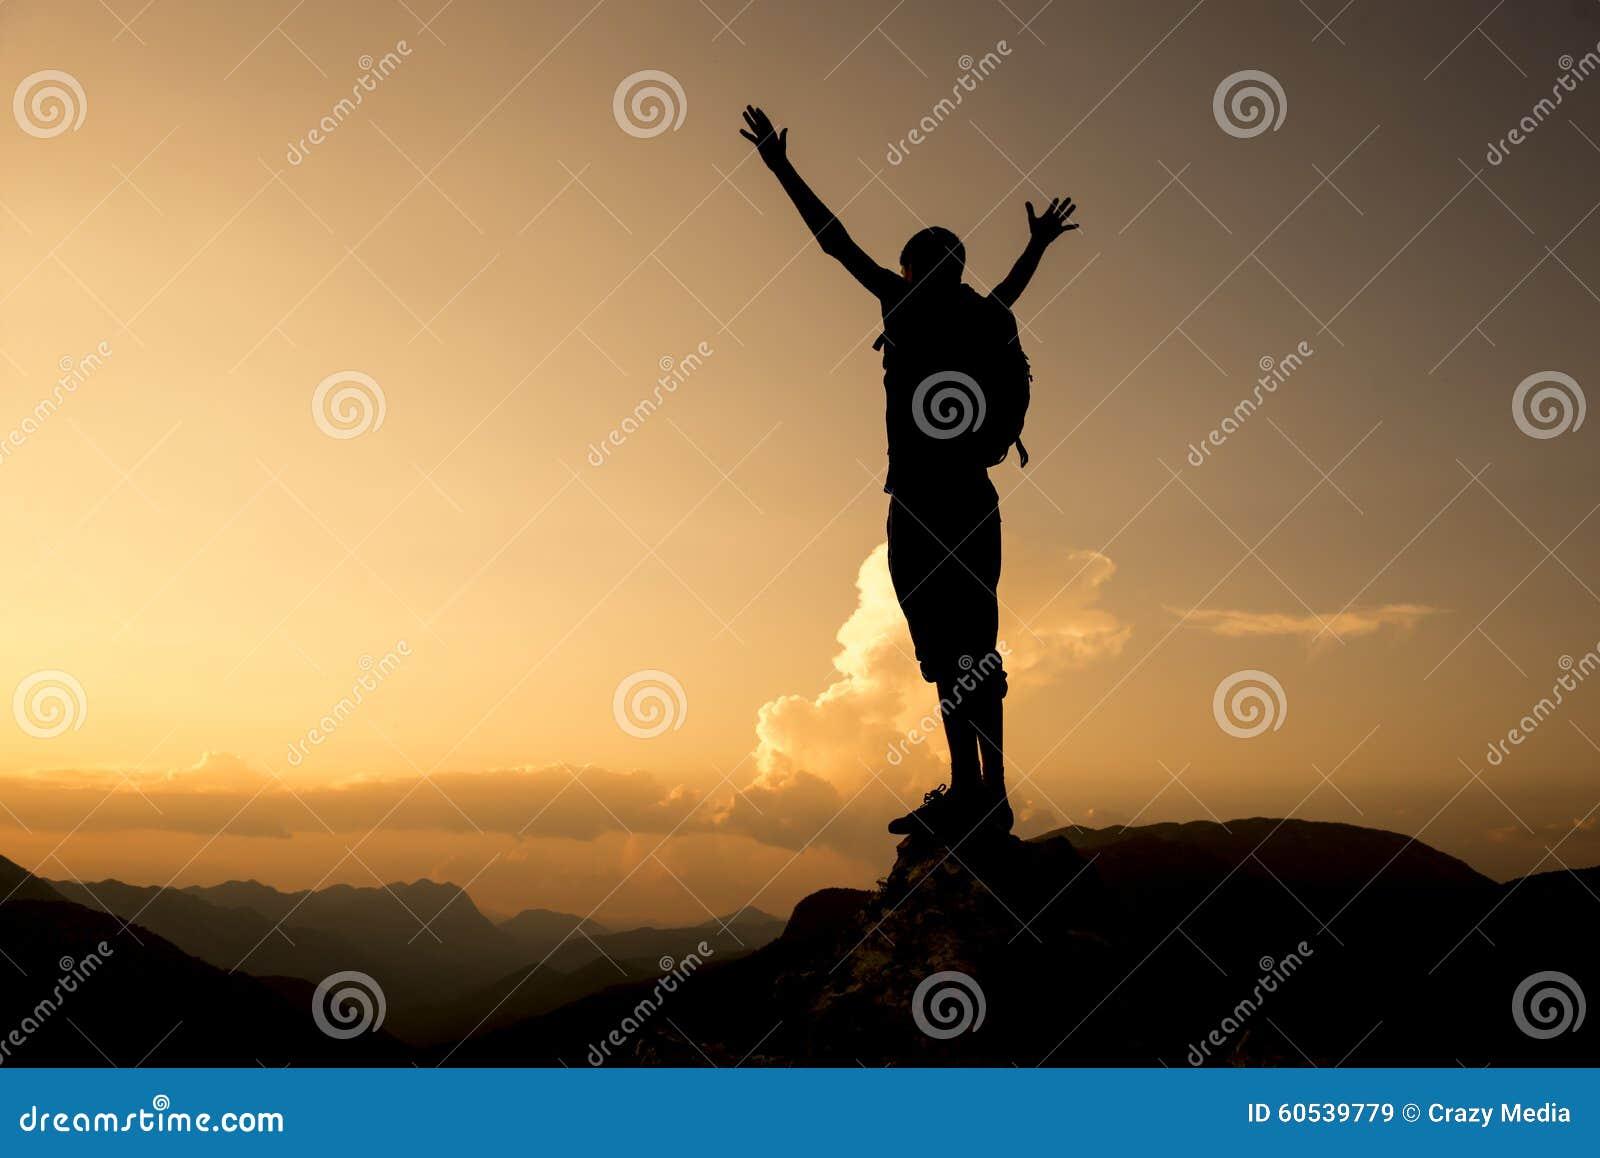 Sucesso e entusiasmo